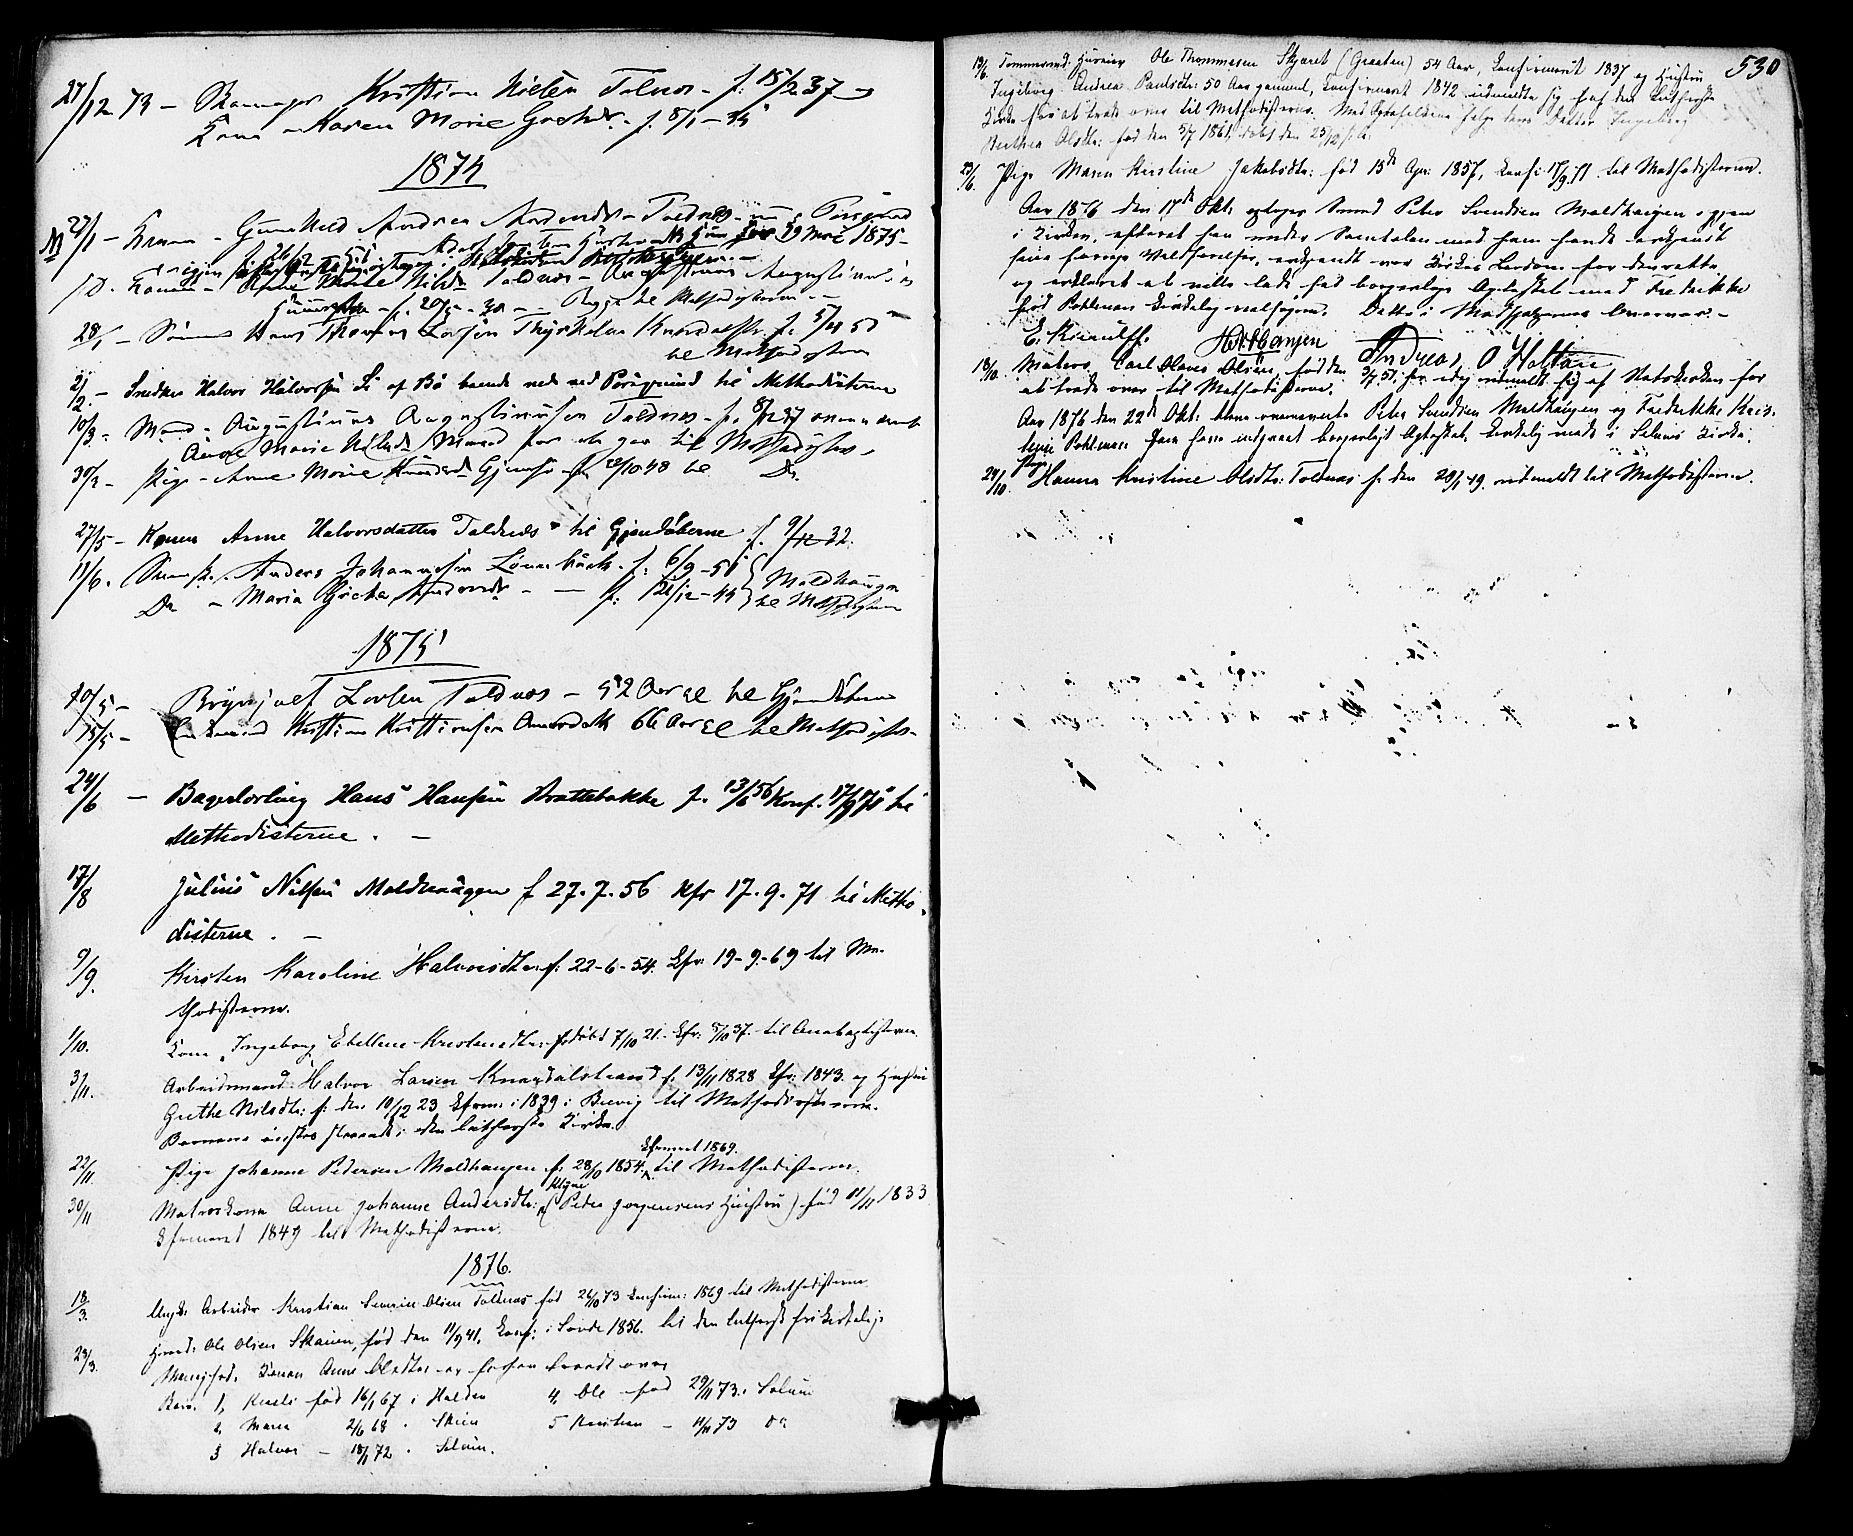 SAKO, Solum kirkebøker, F/Fa/L0008: Ministerialbok nr. I 8, 1865-1876, s. 530